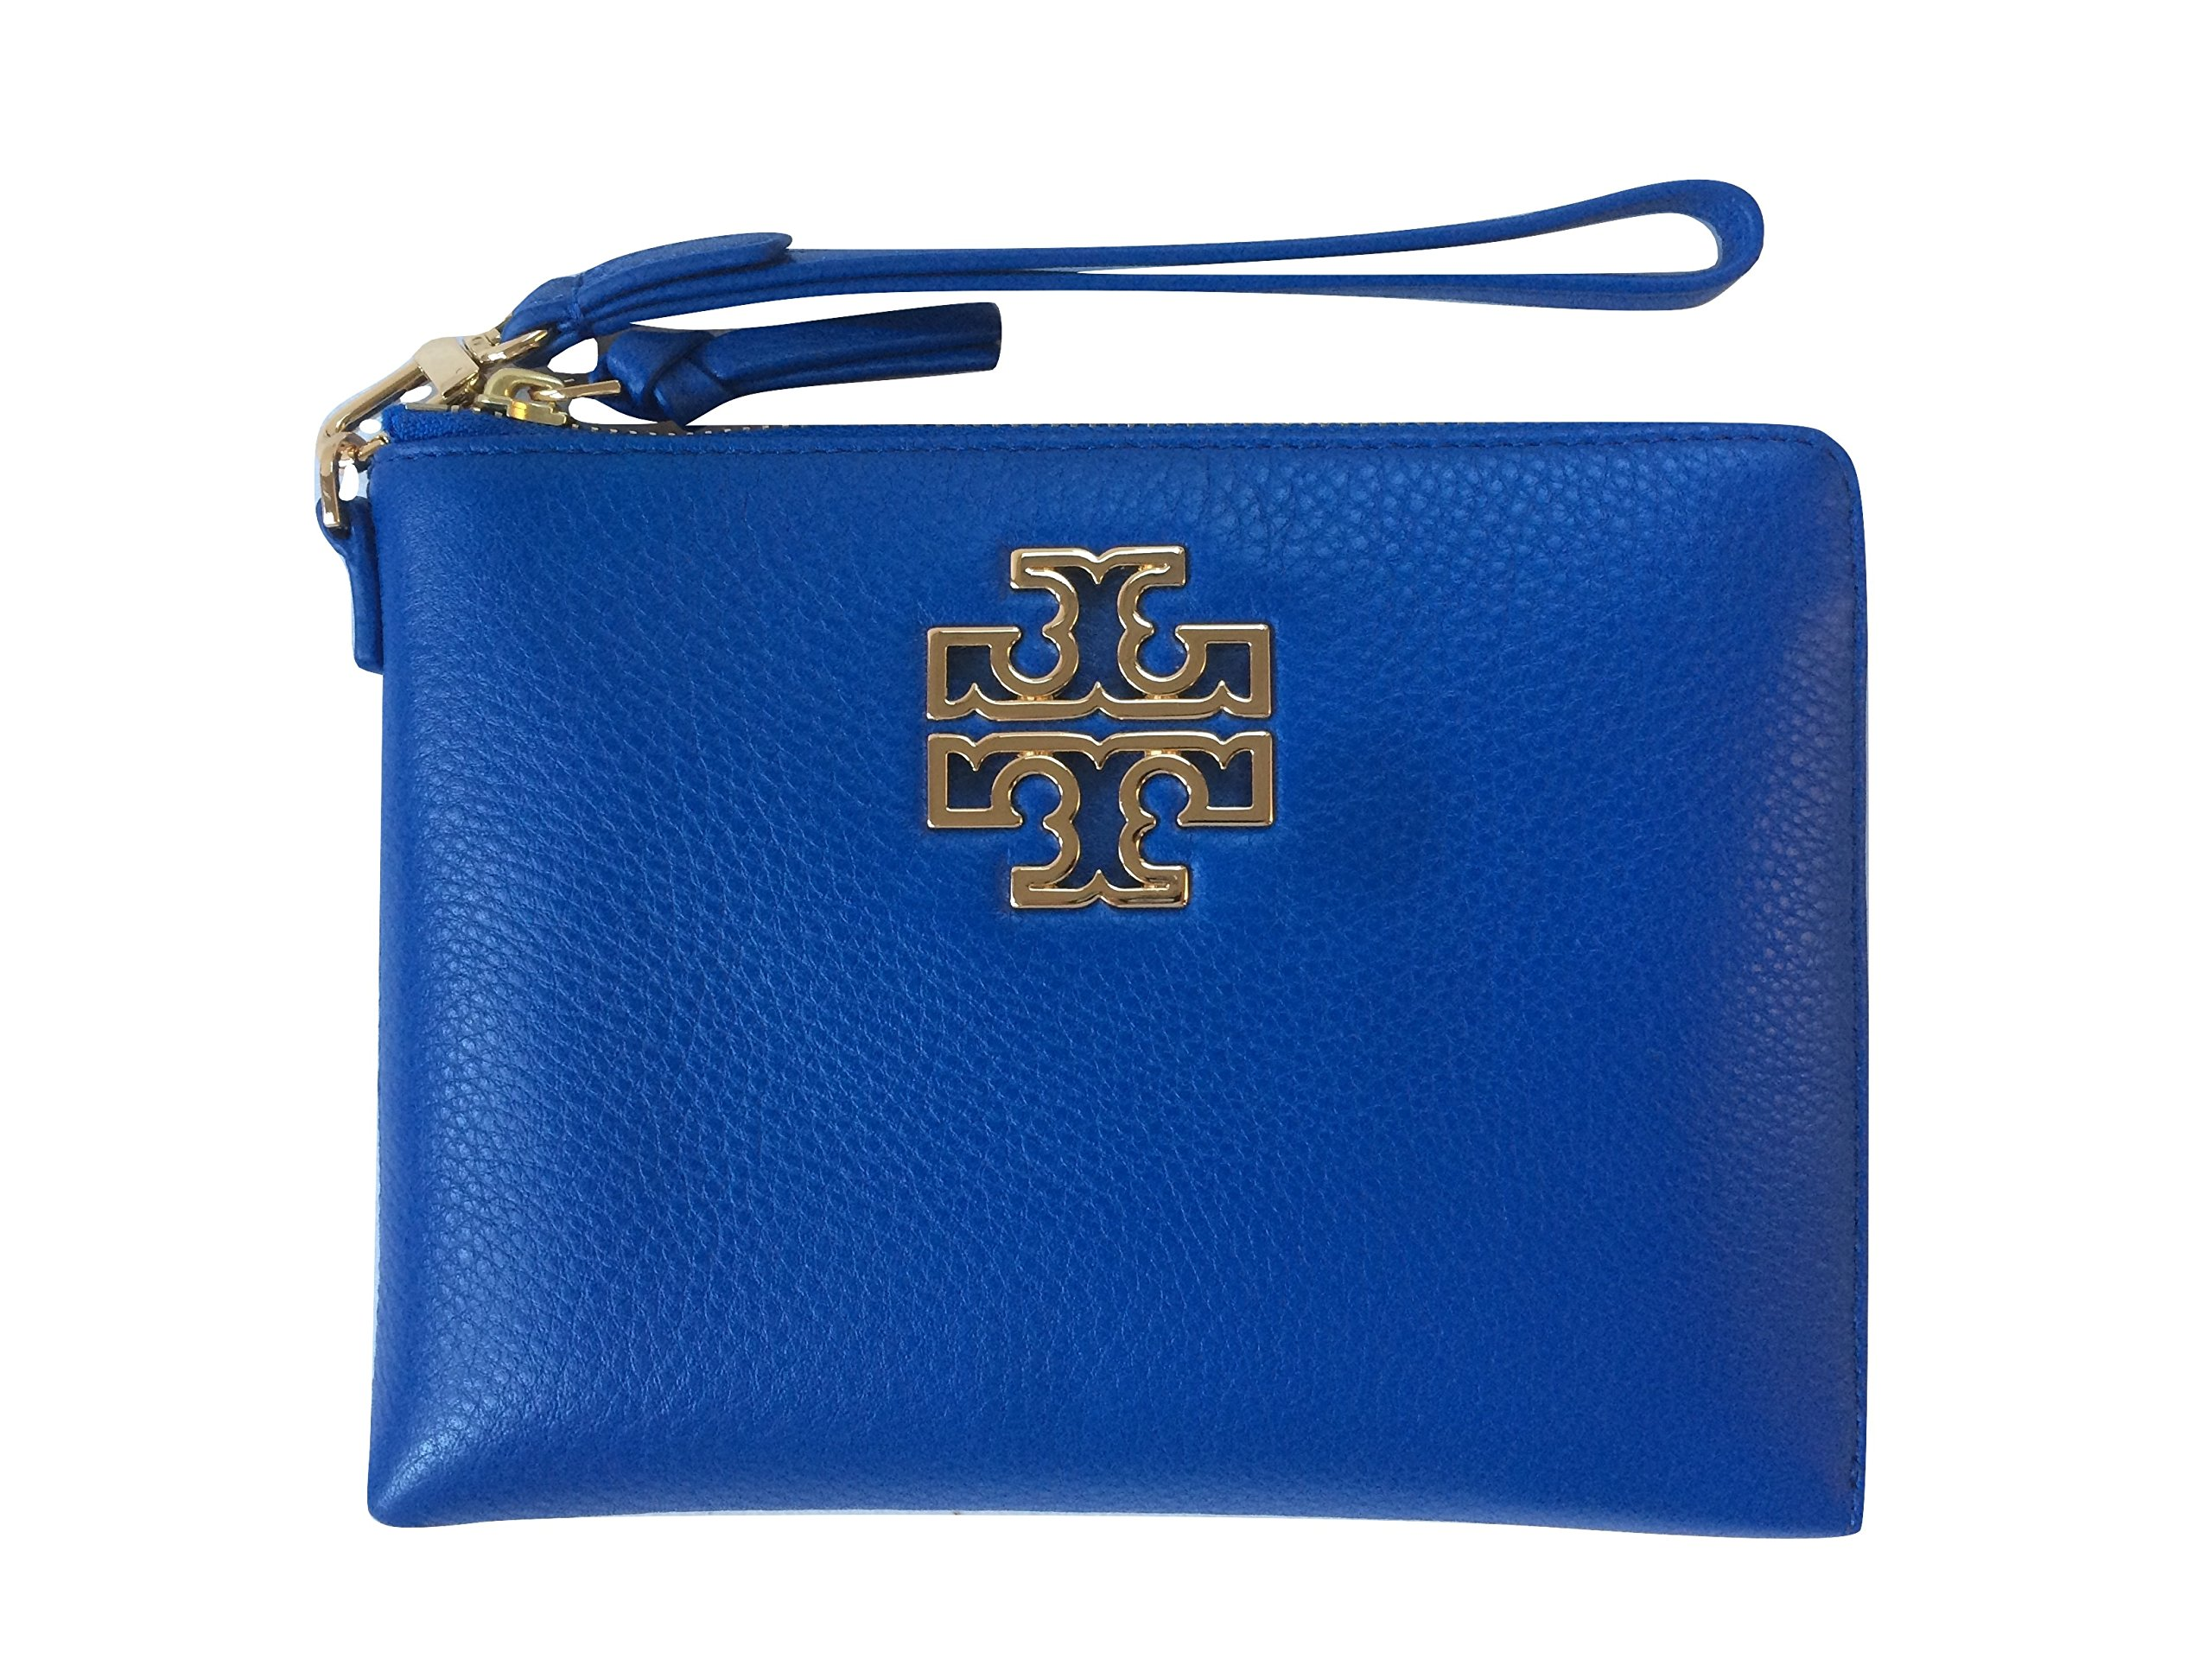 Tory Burch Britten Large Pebbled Leather Zip Pouch Wristlet (Bondi Blue)